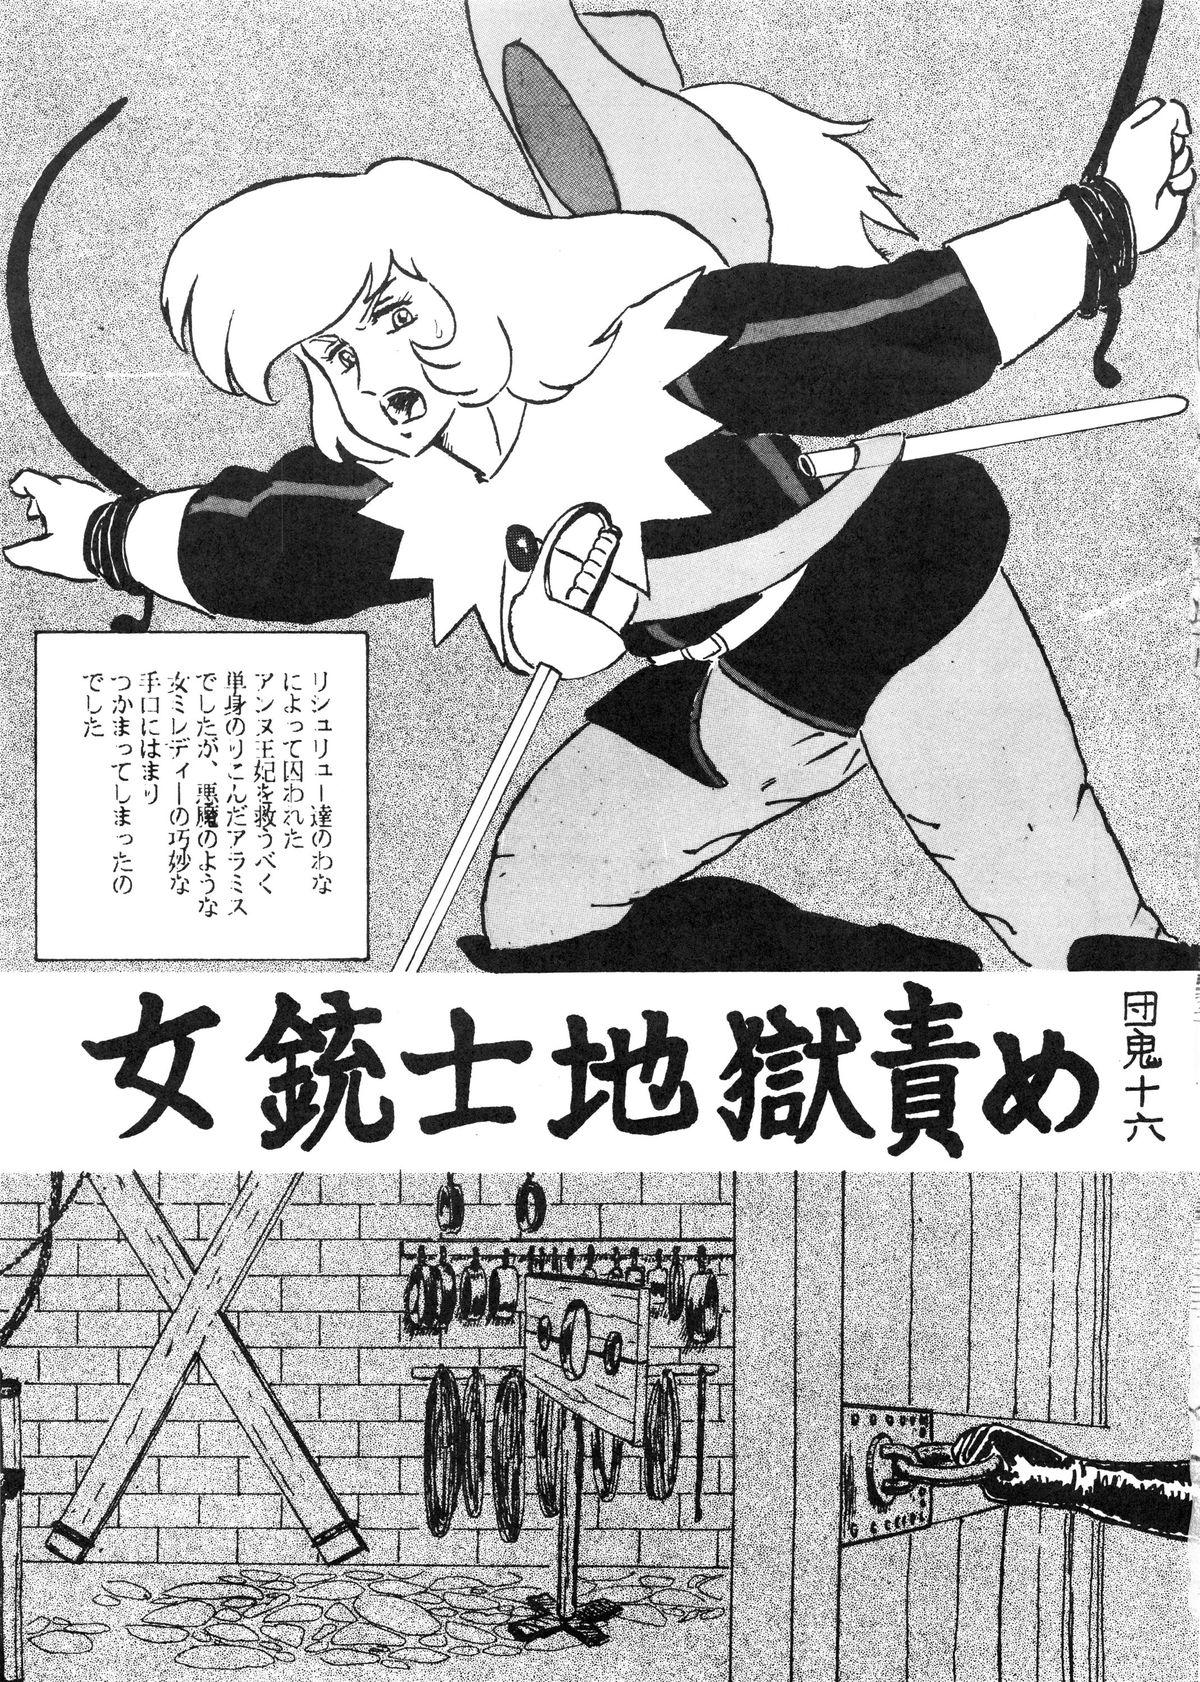 [Secret Society Chi (Iijima Mario)] Kai II - Iijima Mario Kojin-shi - (Various) 23